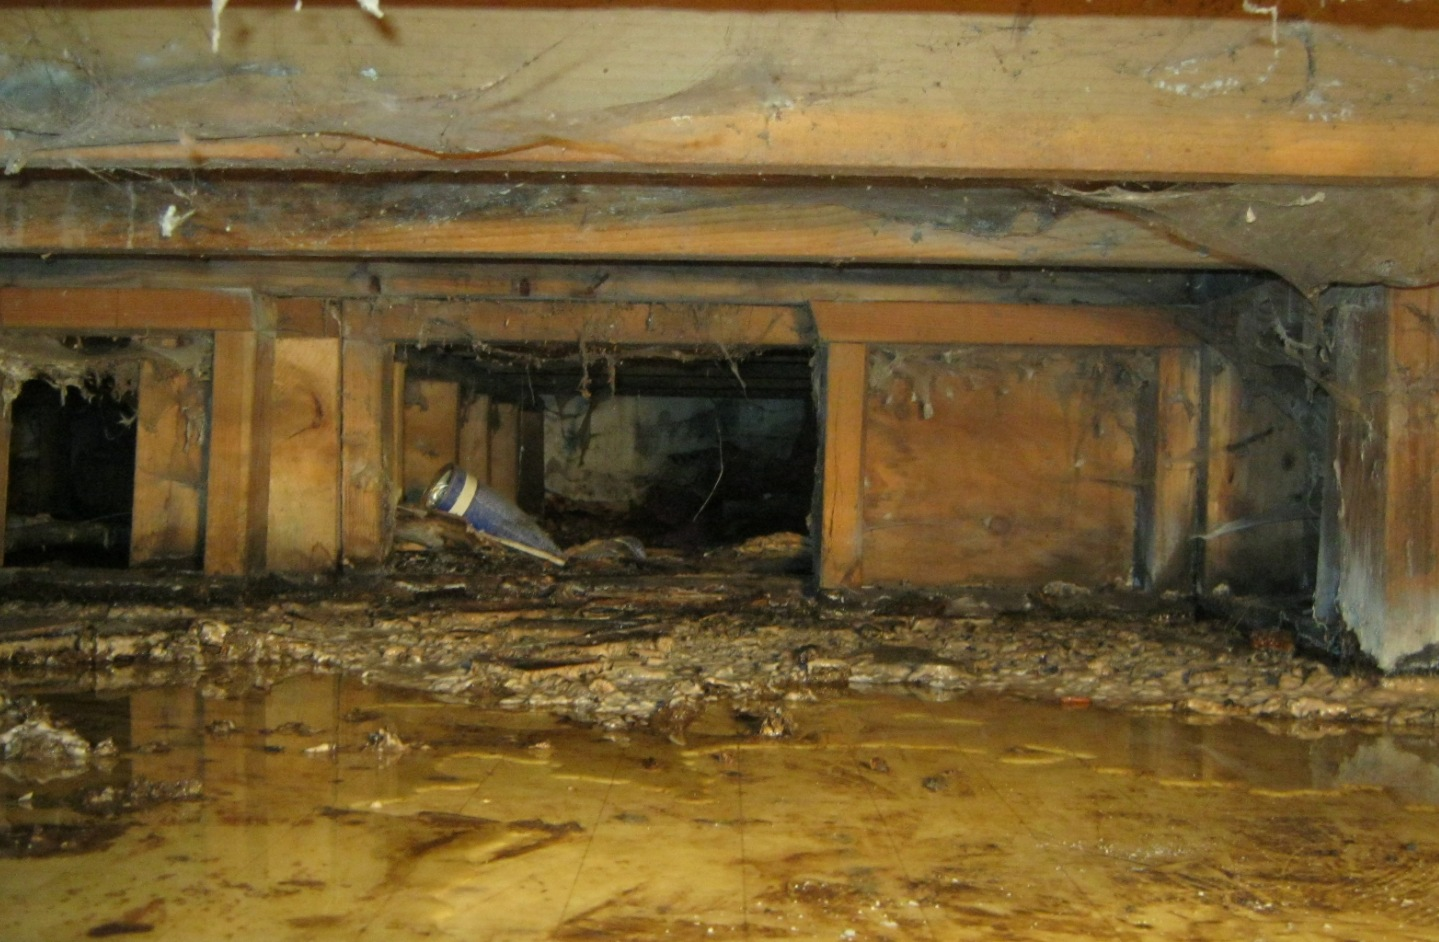 Mold crawlspace wet